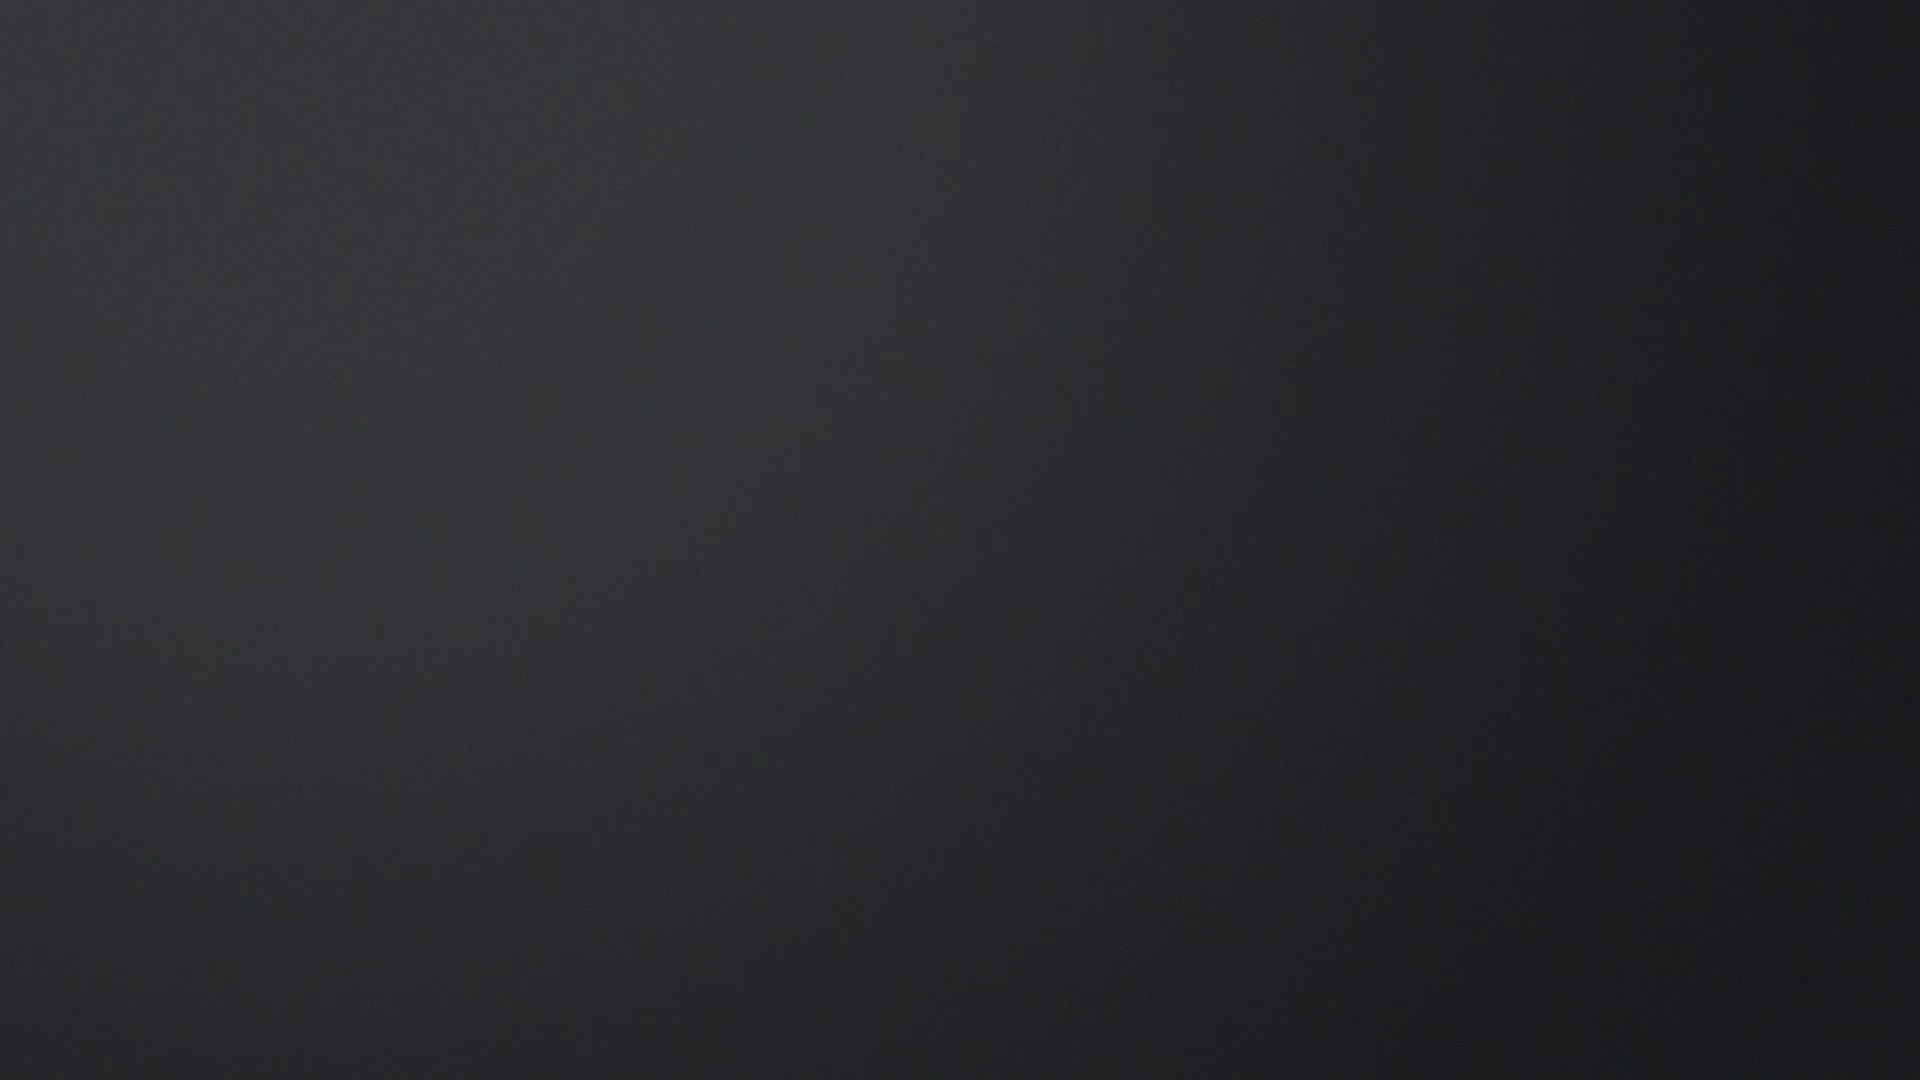 Logitech MX Anywhere 2S Ratón Inalámbrico, Multi-Ordenadores, 2.4 GHz y Bluetooth con Receptor Unifying USB, Seguimiento Láser 200/4000 DPI Toda Superficie, 7 Botones, Portátil/PC/Mac/iPad OS, Blanco: Logitech: Amazon.es: Informática